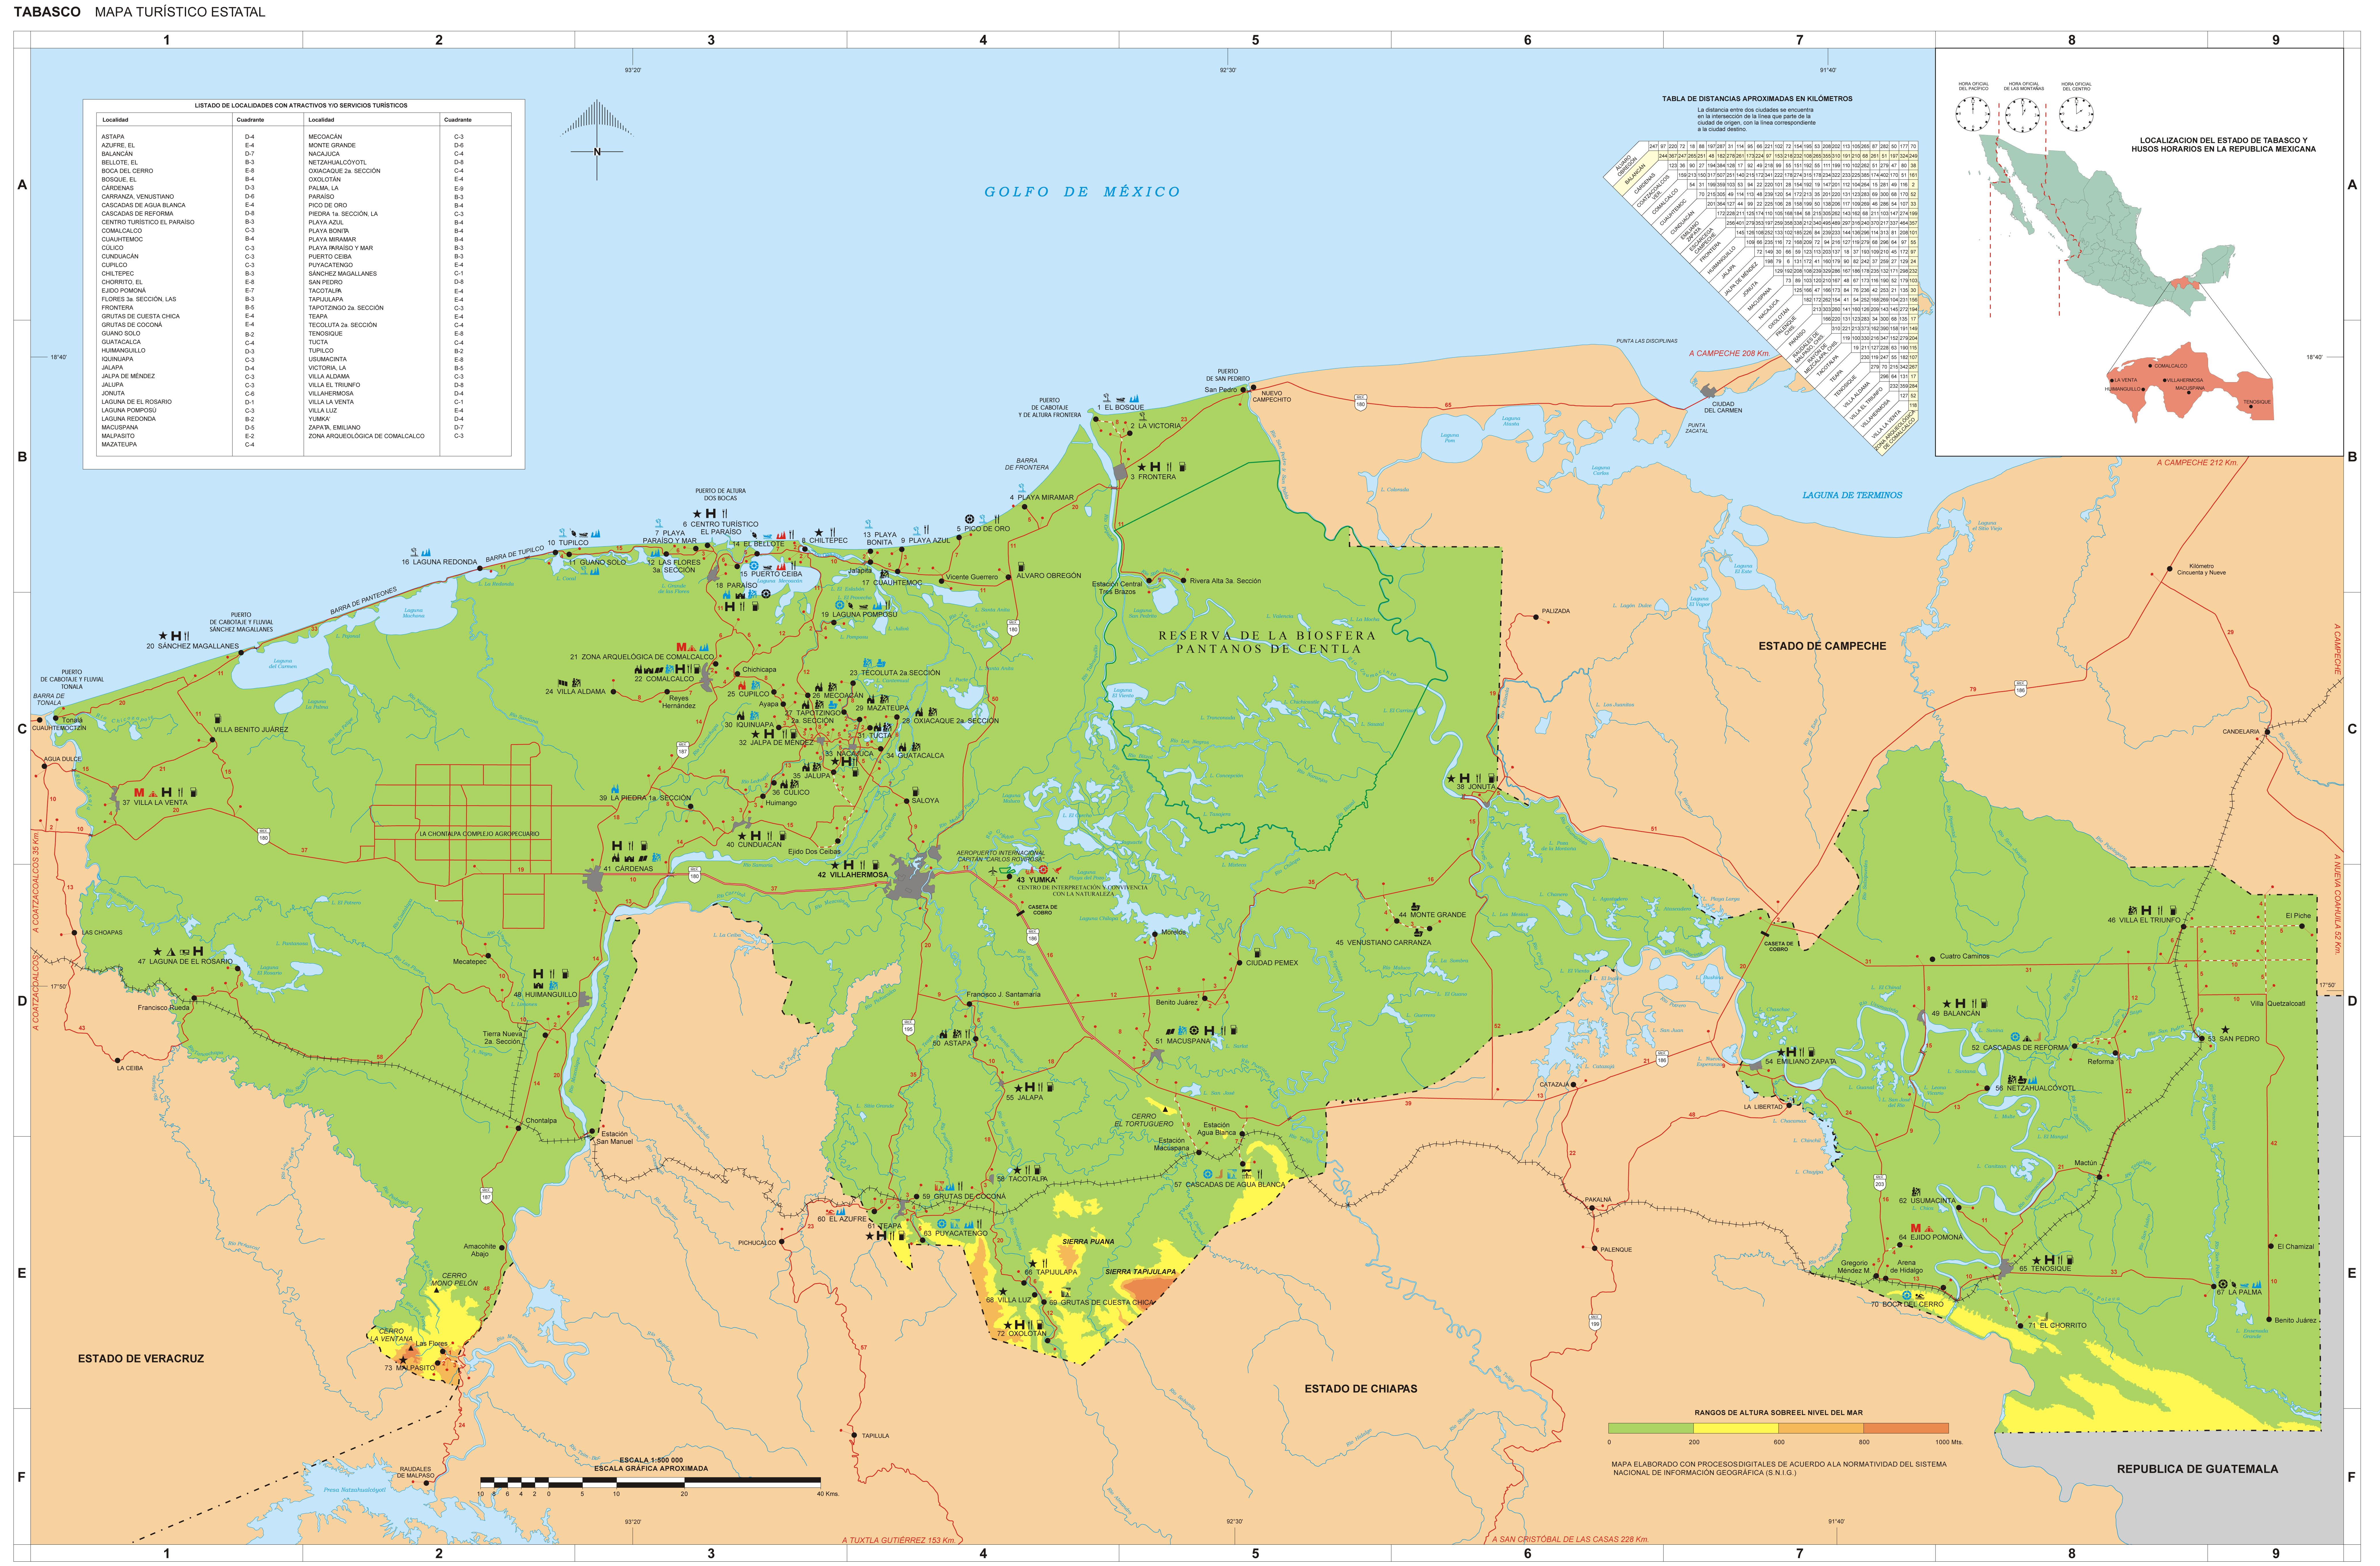 map of central california with Mapa De Tabasco on Syria liveuamap further Davenport Pier Beach besides Davenport Landing Beach additionally San francisco cityscape5907 further Zona Arqueologica Ek Balam Yucatan.